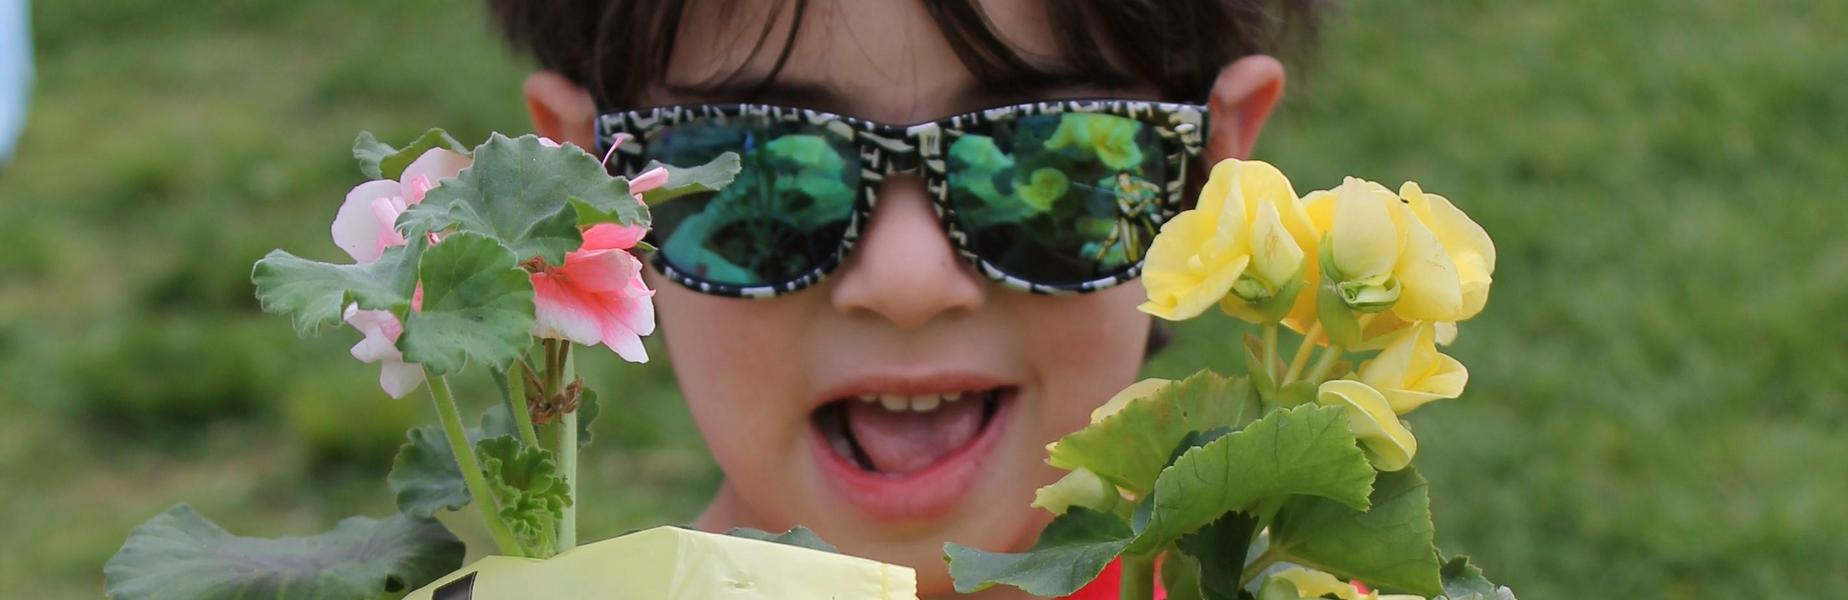 Lincoln School kindergartner enjoys annual Flower Patch.